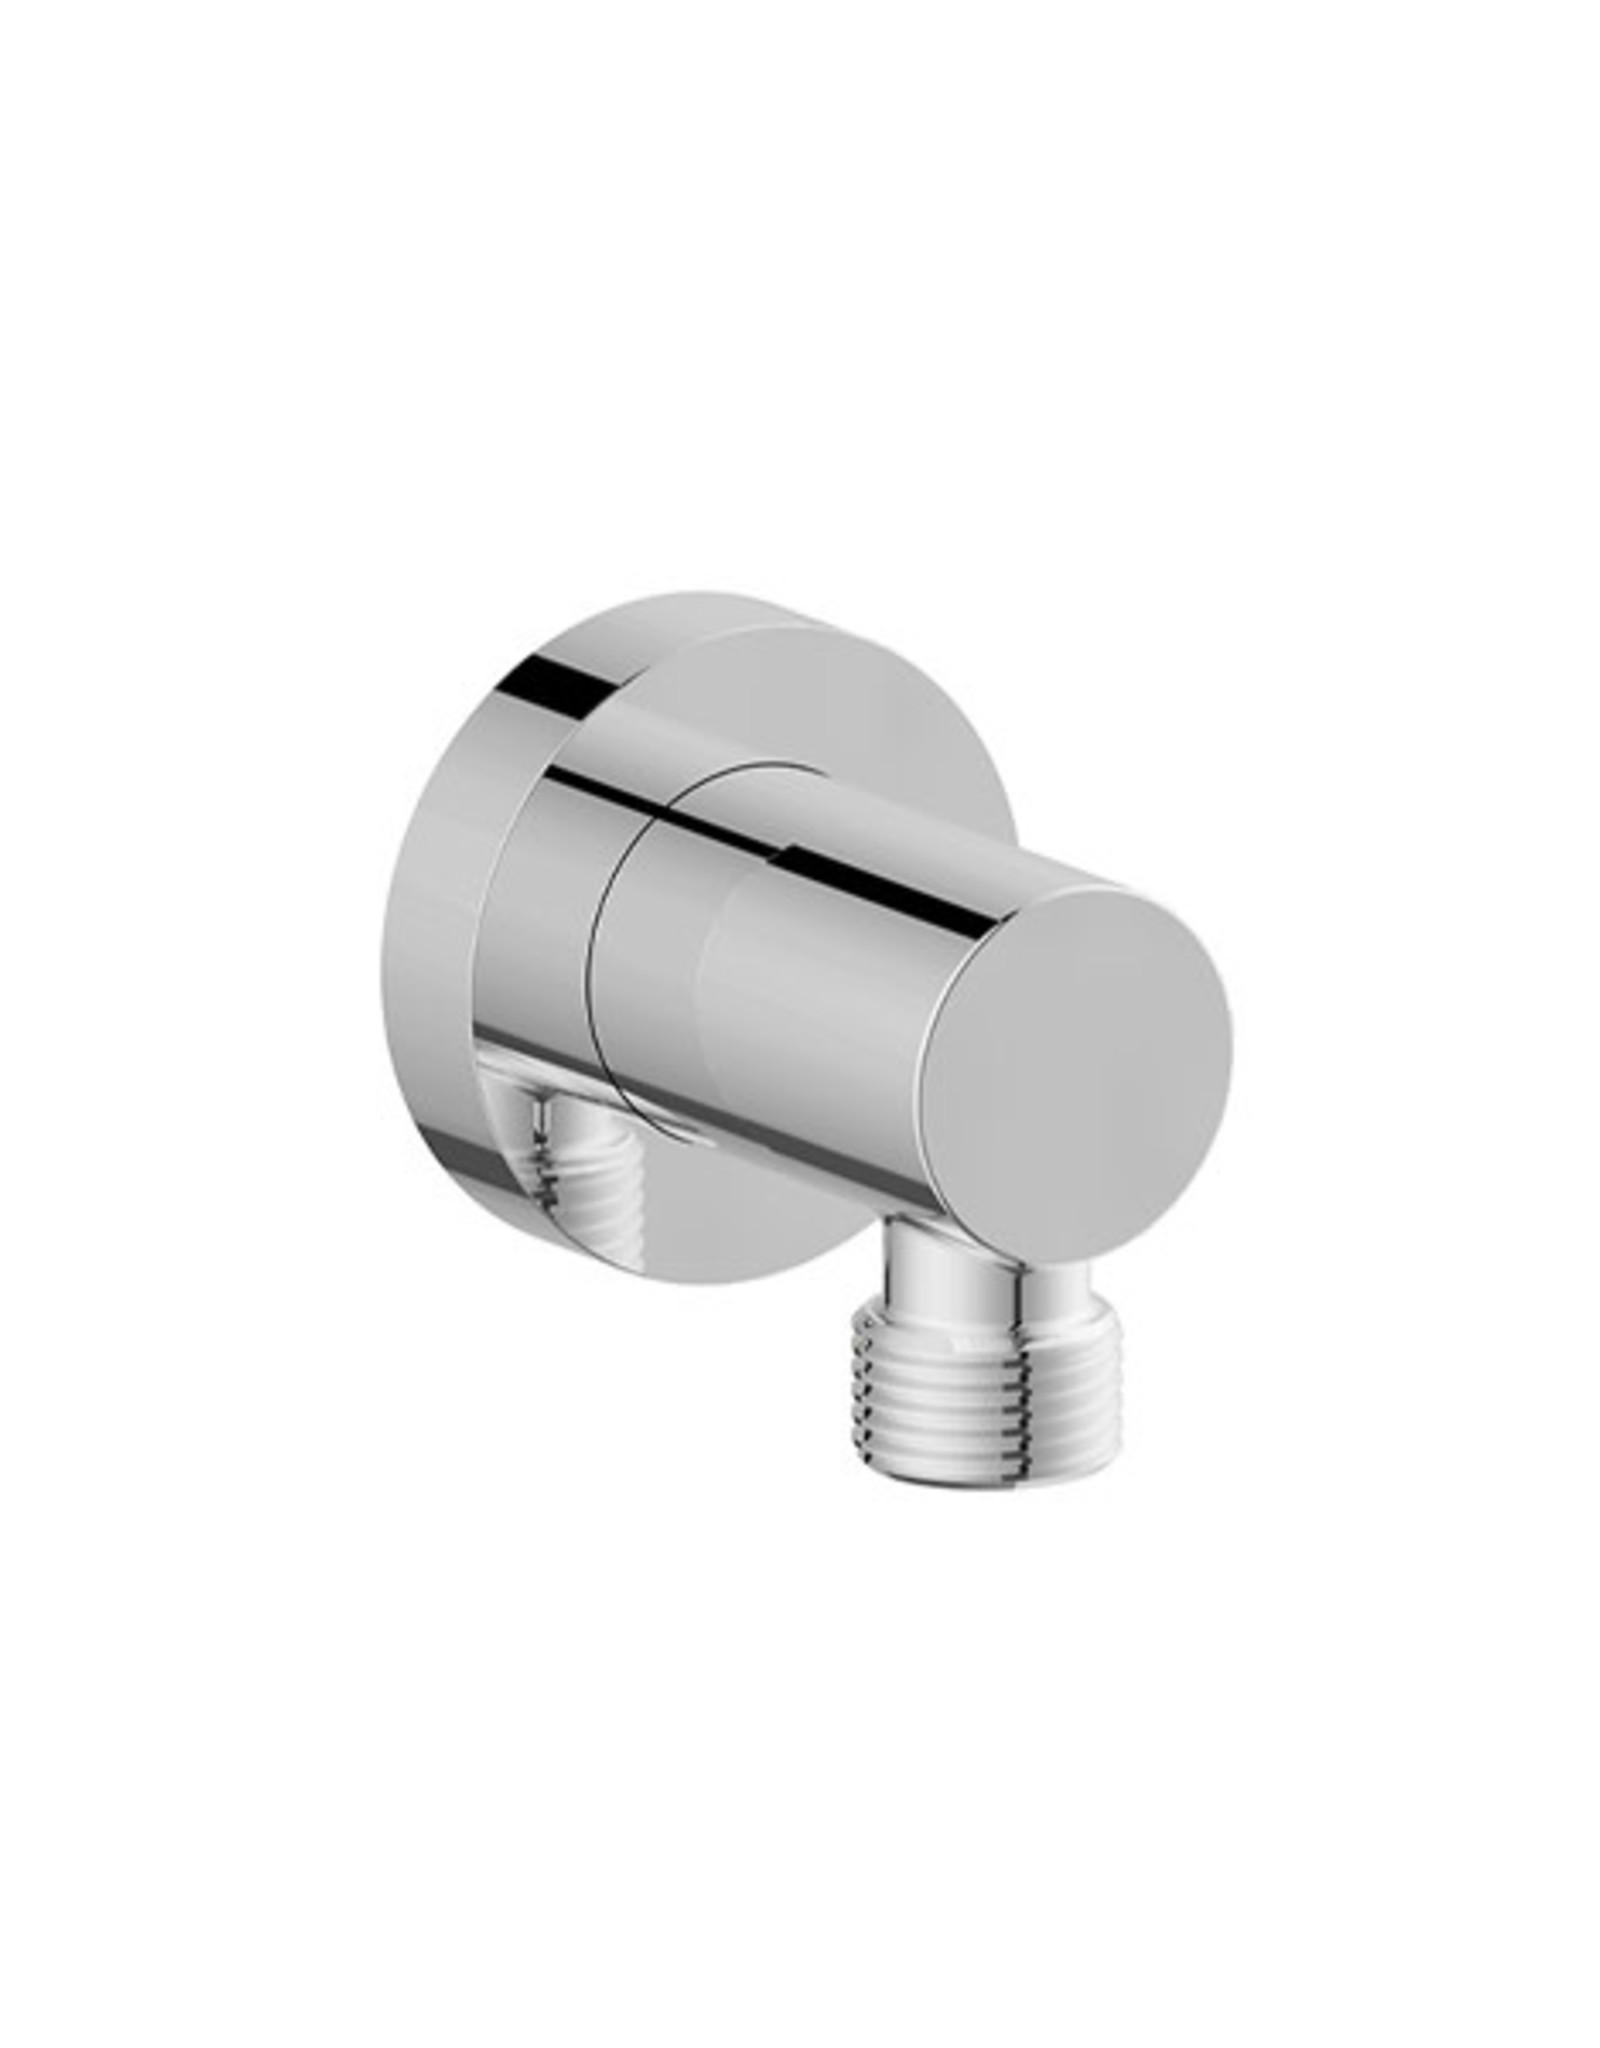 Vogt Round Drop Elbow- Chrome